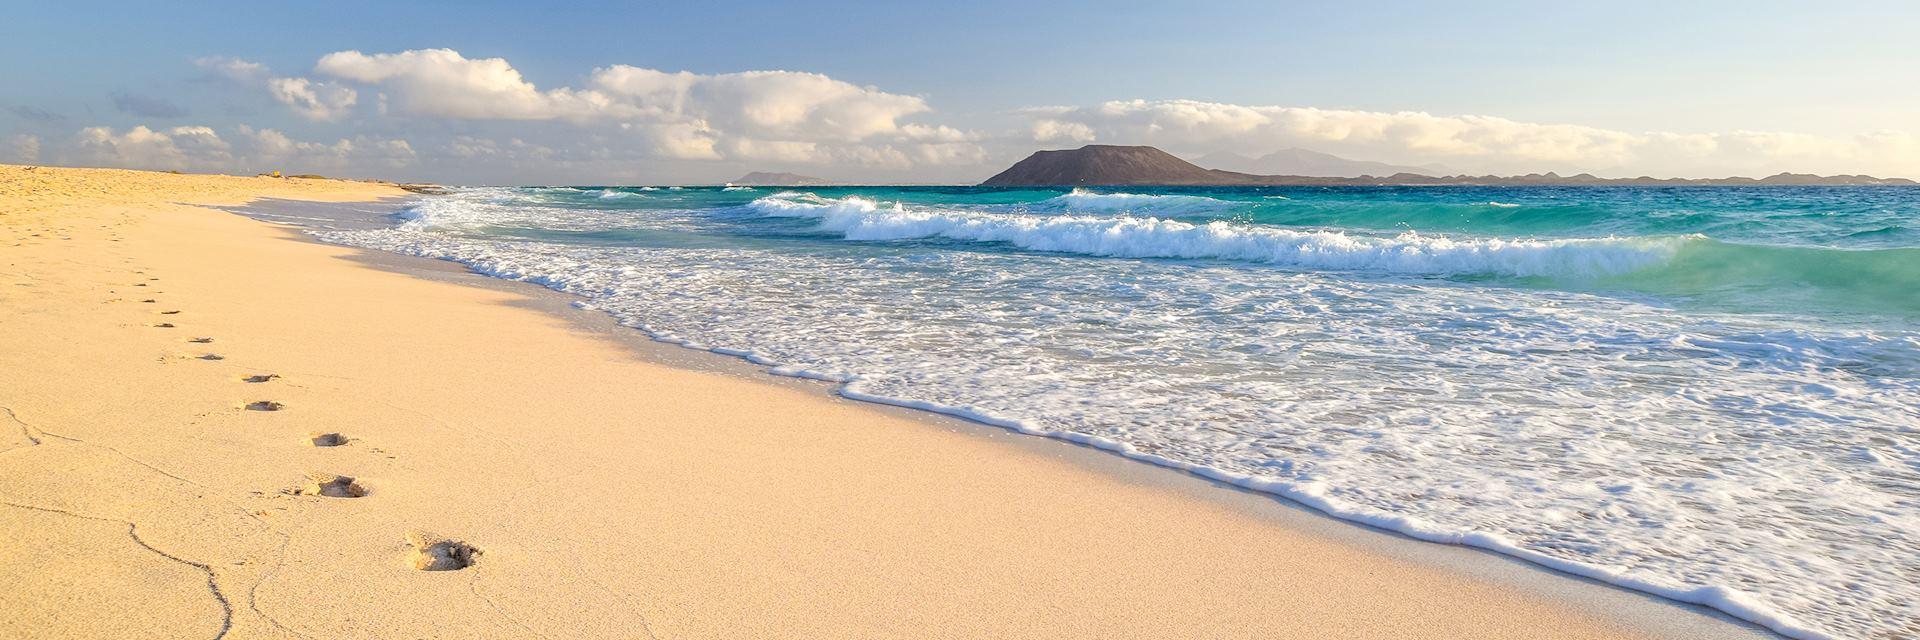 Footprints on beach in Canary Islands, Spain